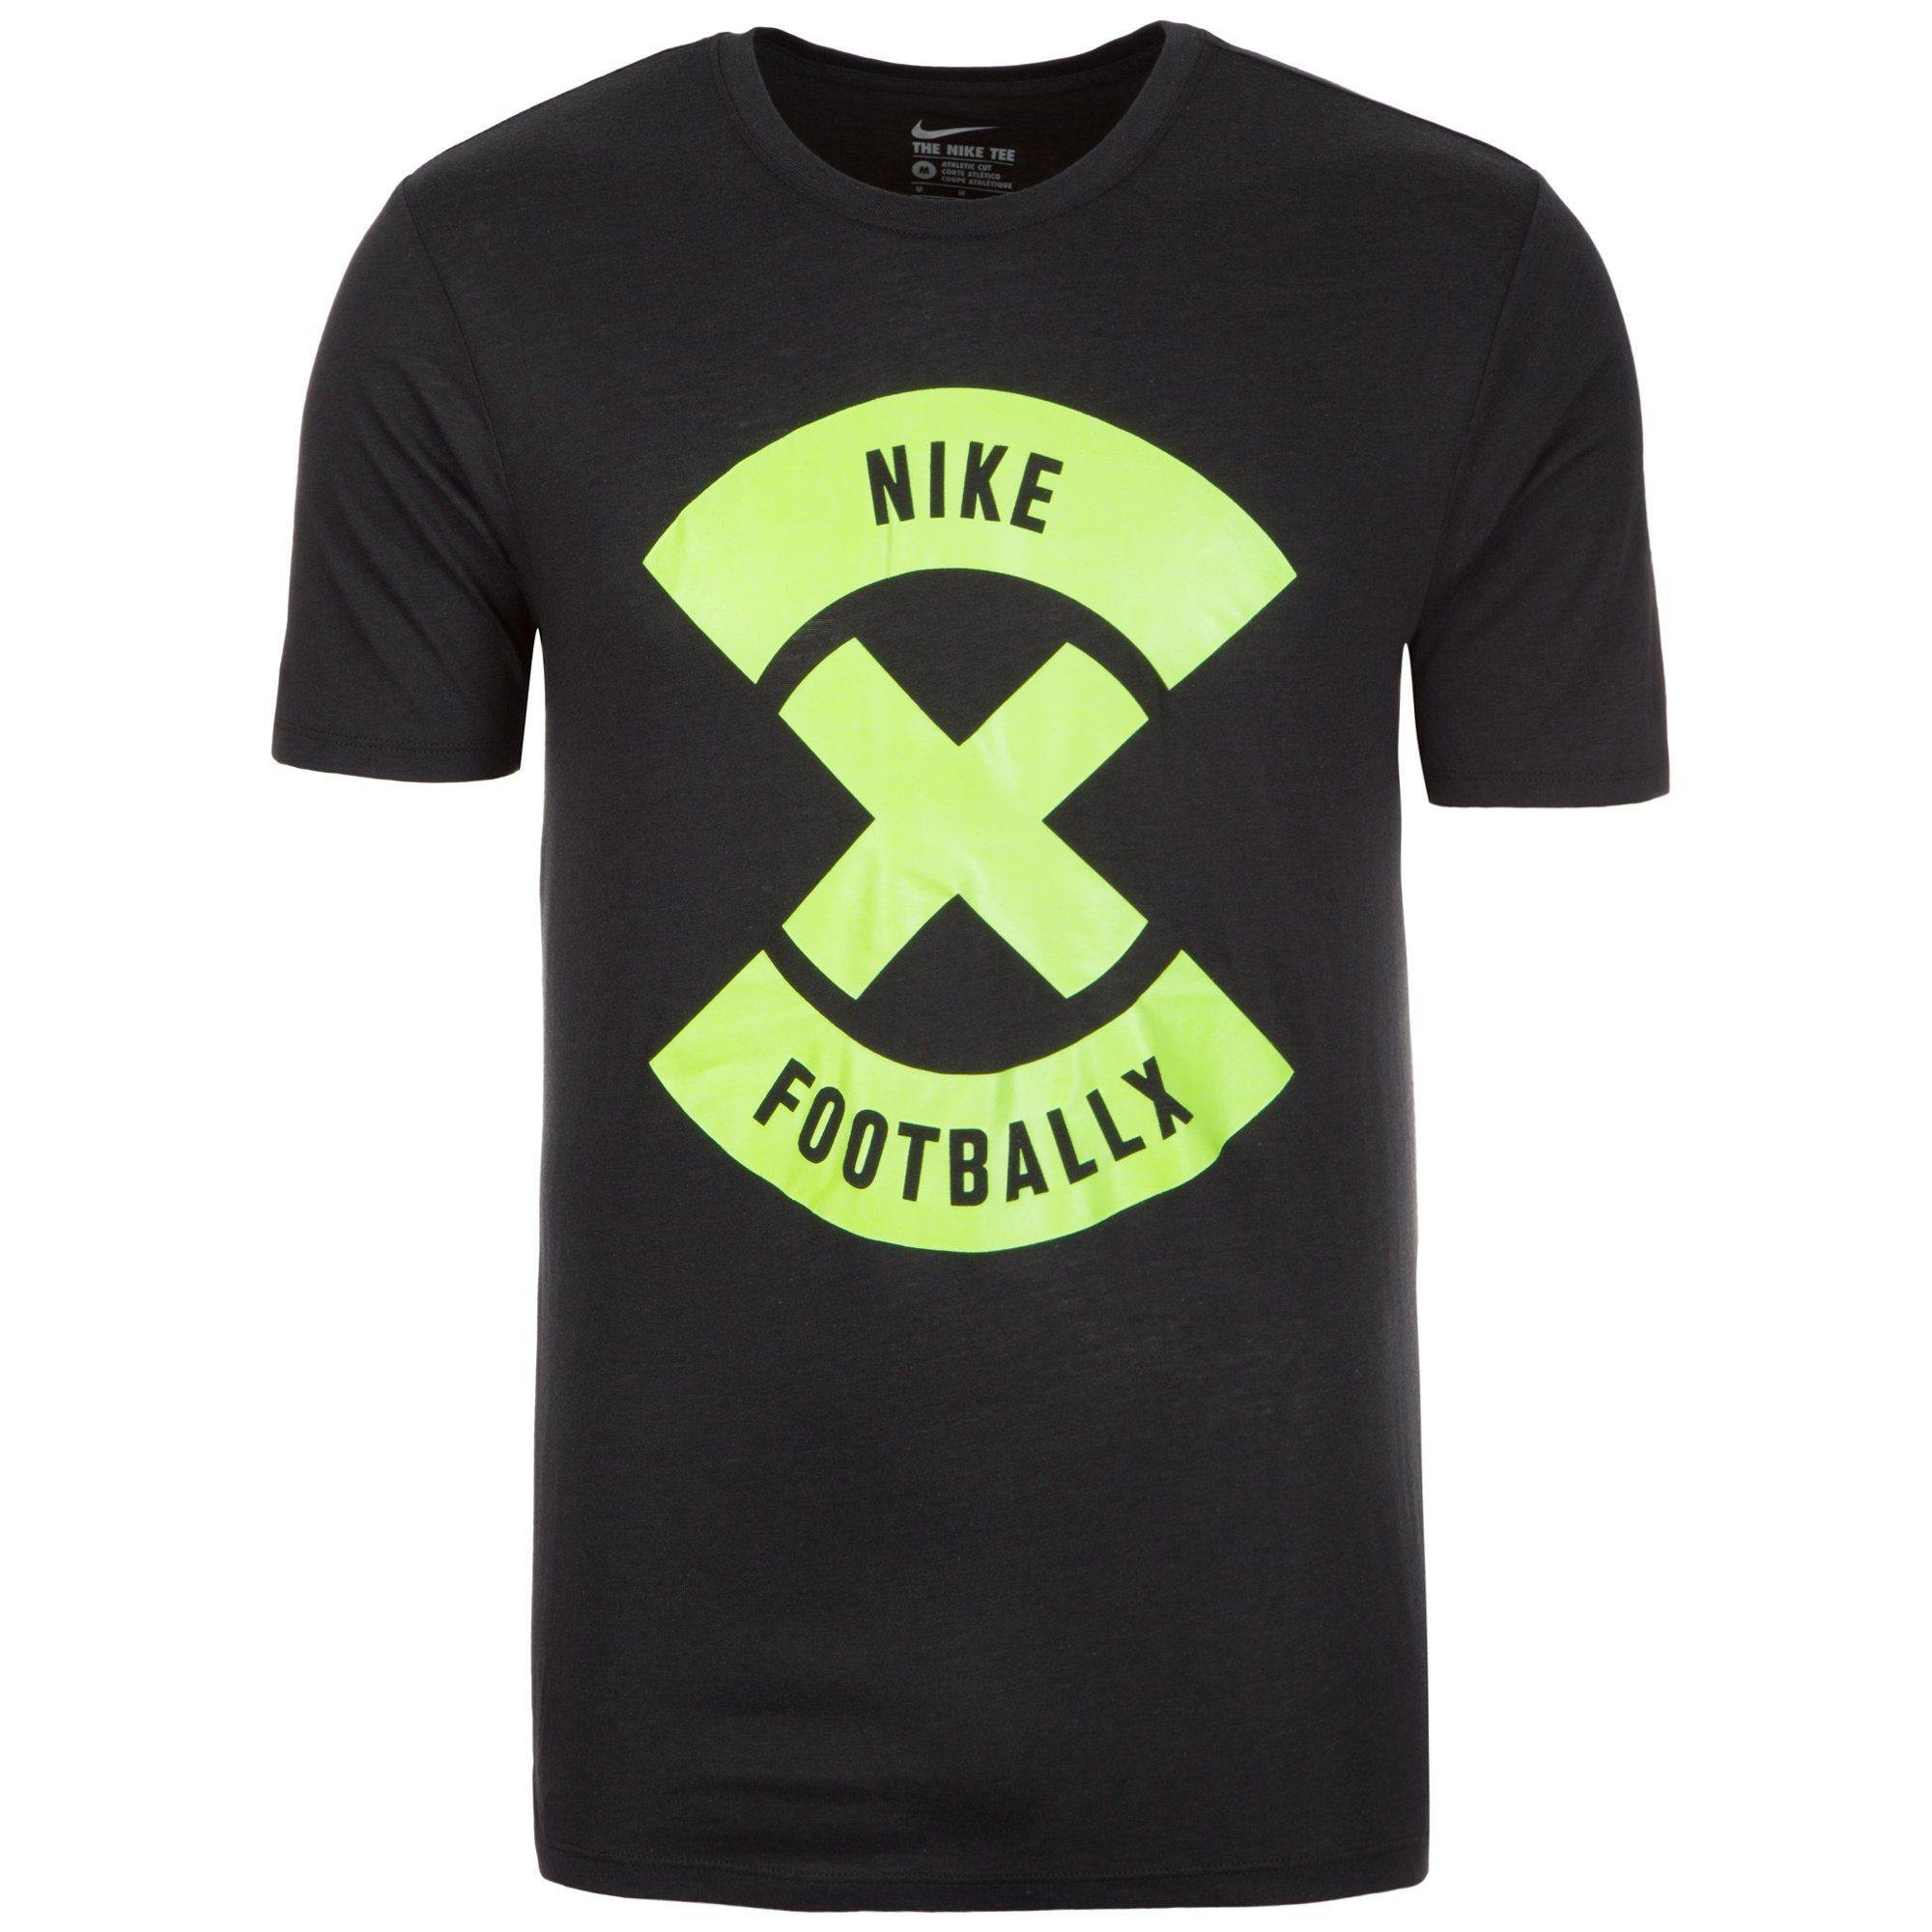 Nike T-Shirt »Football X Glow« | Bekleidung > Shirts > T-Shirts | Schwarz | NIKE